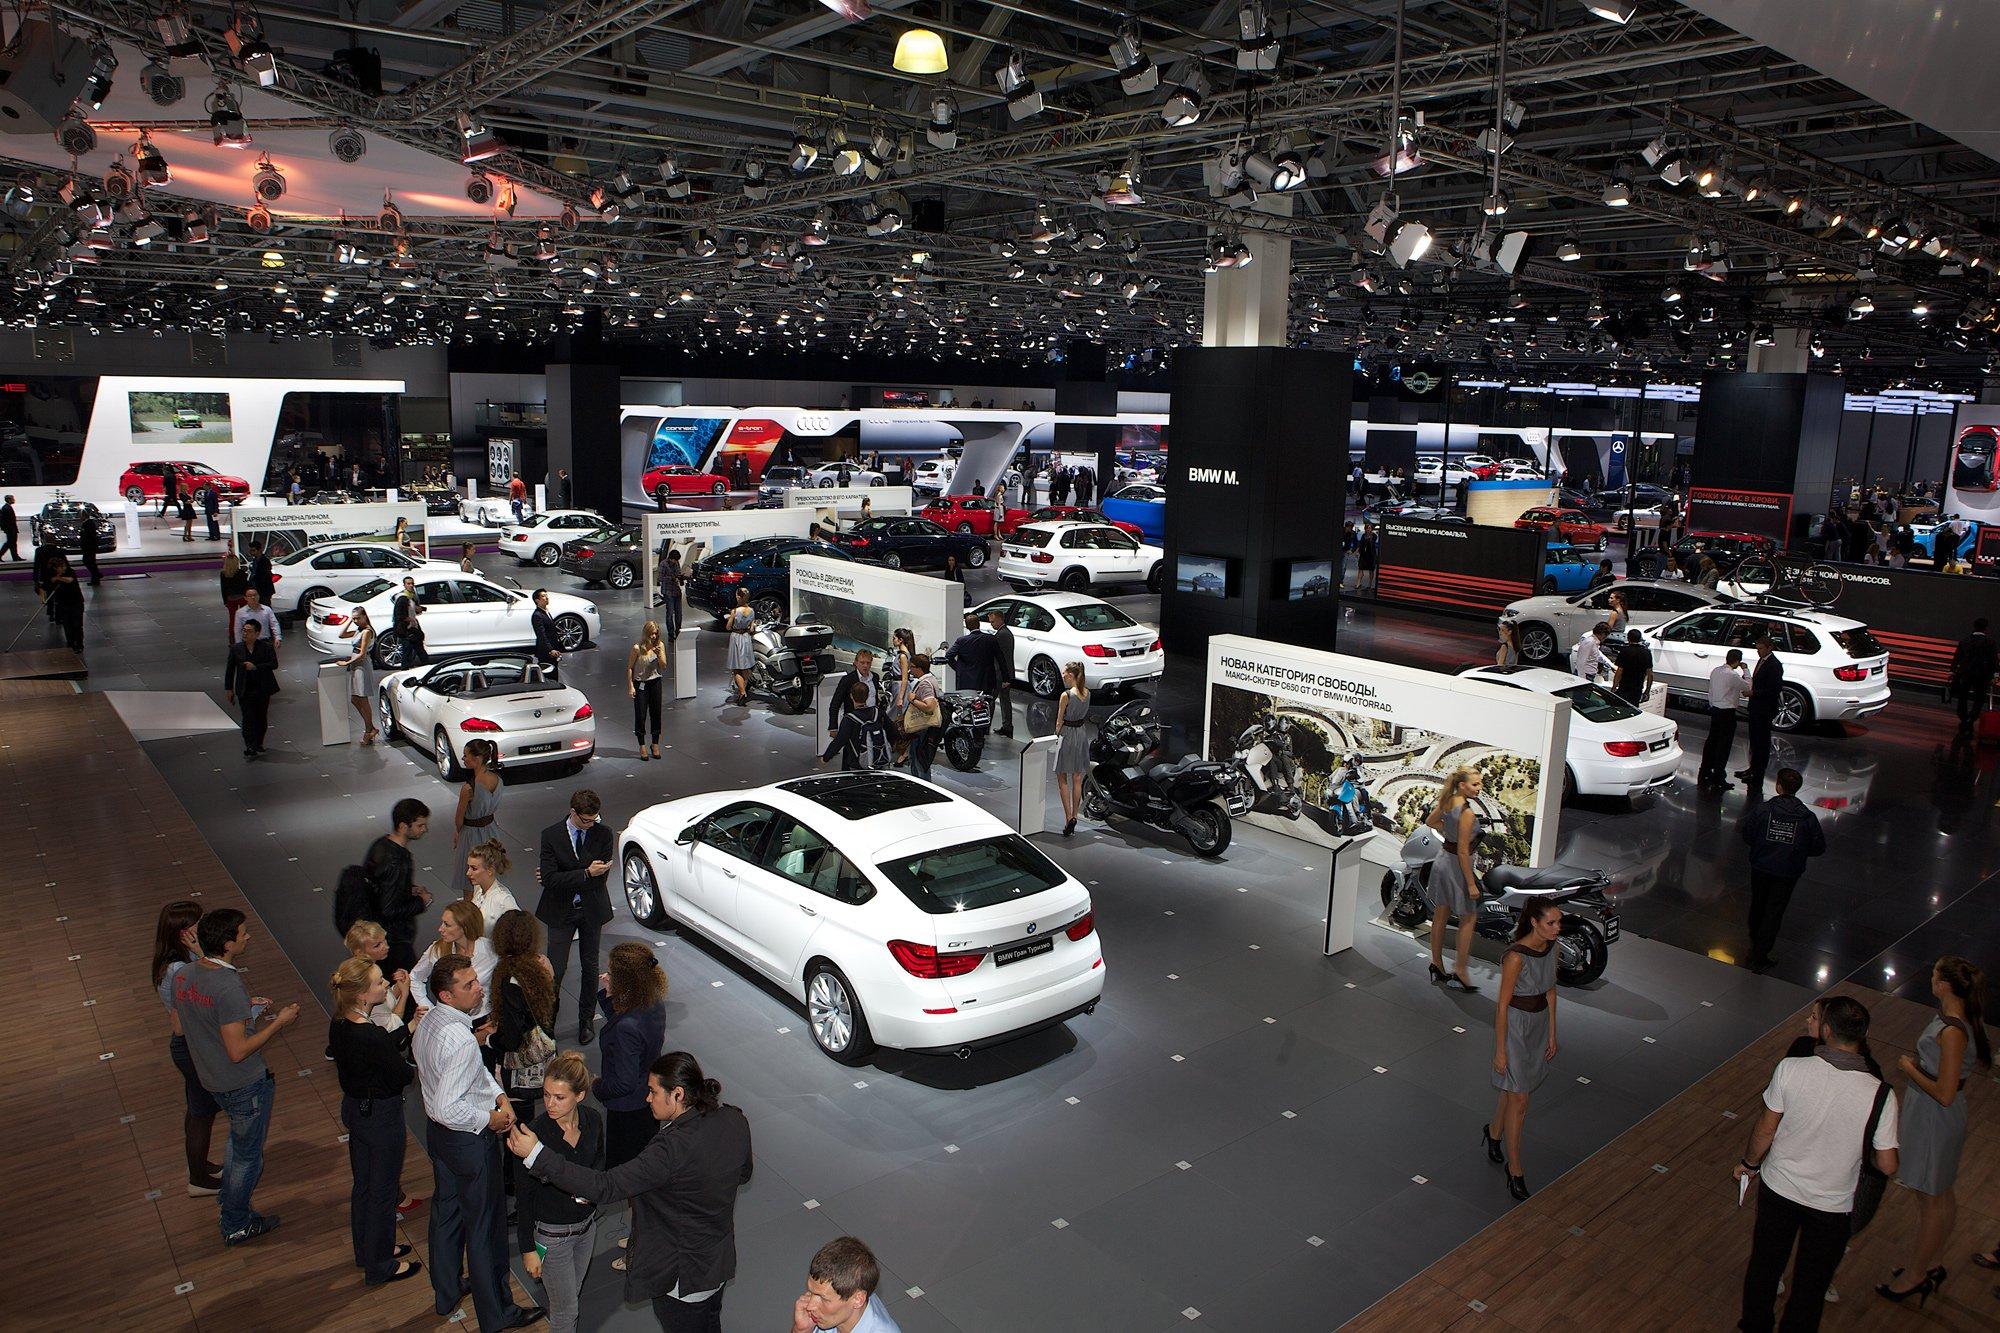 Al Yemni Cars Exhibition Al Yemni Group - Exhibition car